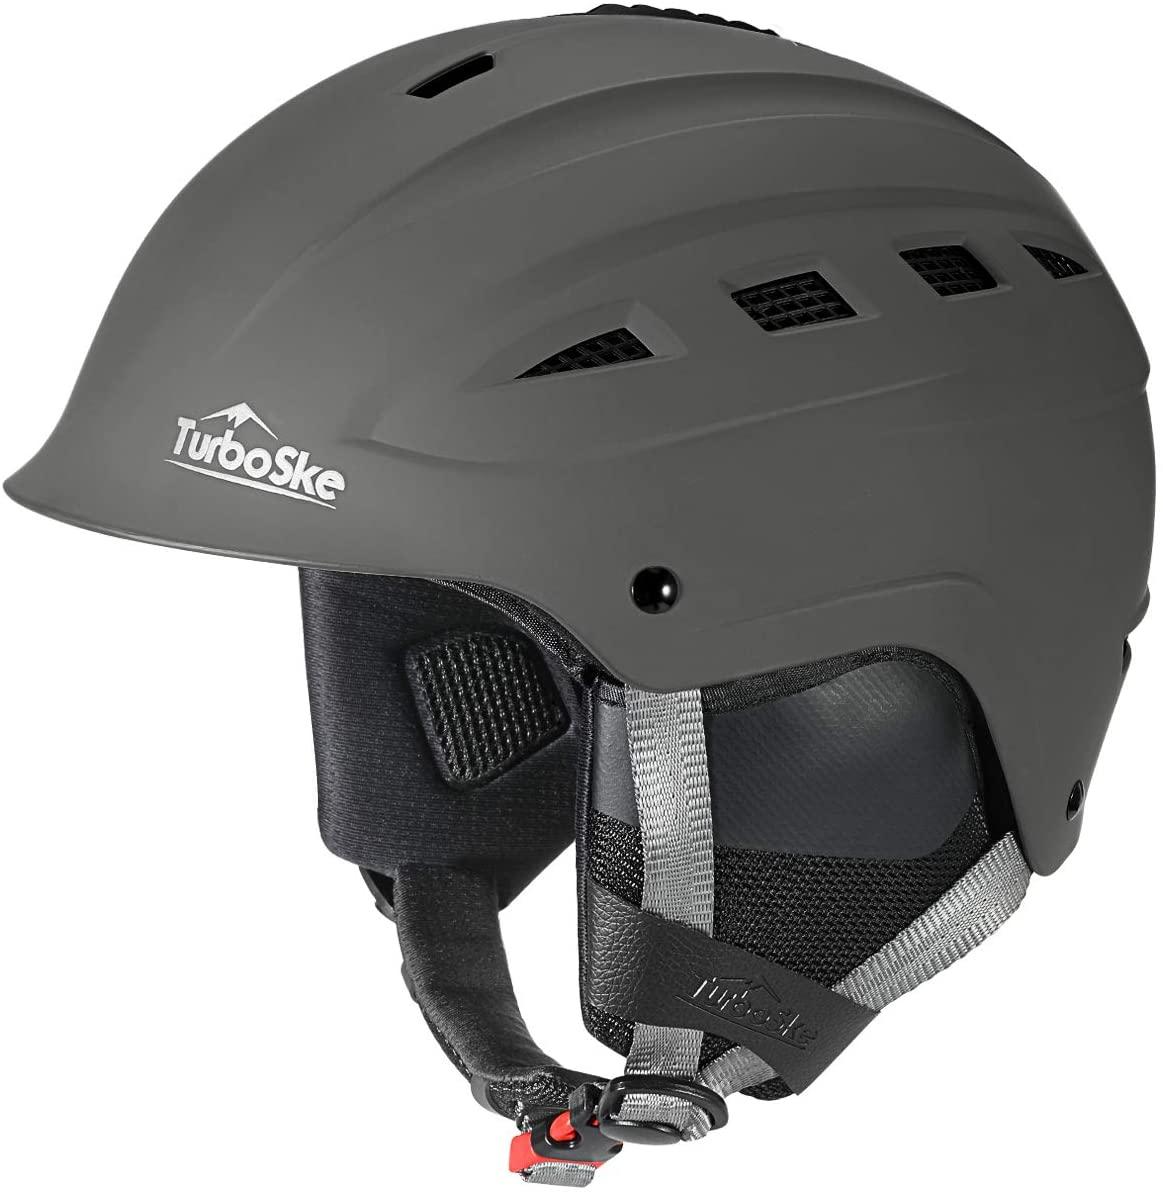 TurboSke Ski Helmet, Snowboard Helmet, Snow Sports Helmet, Audio Compatible for Men Women and Youth